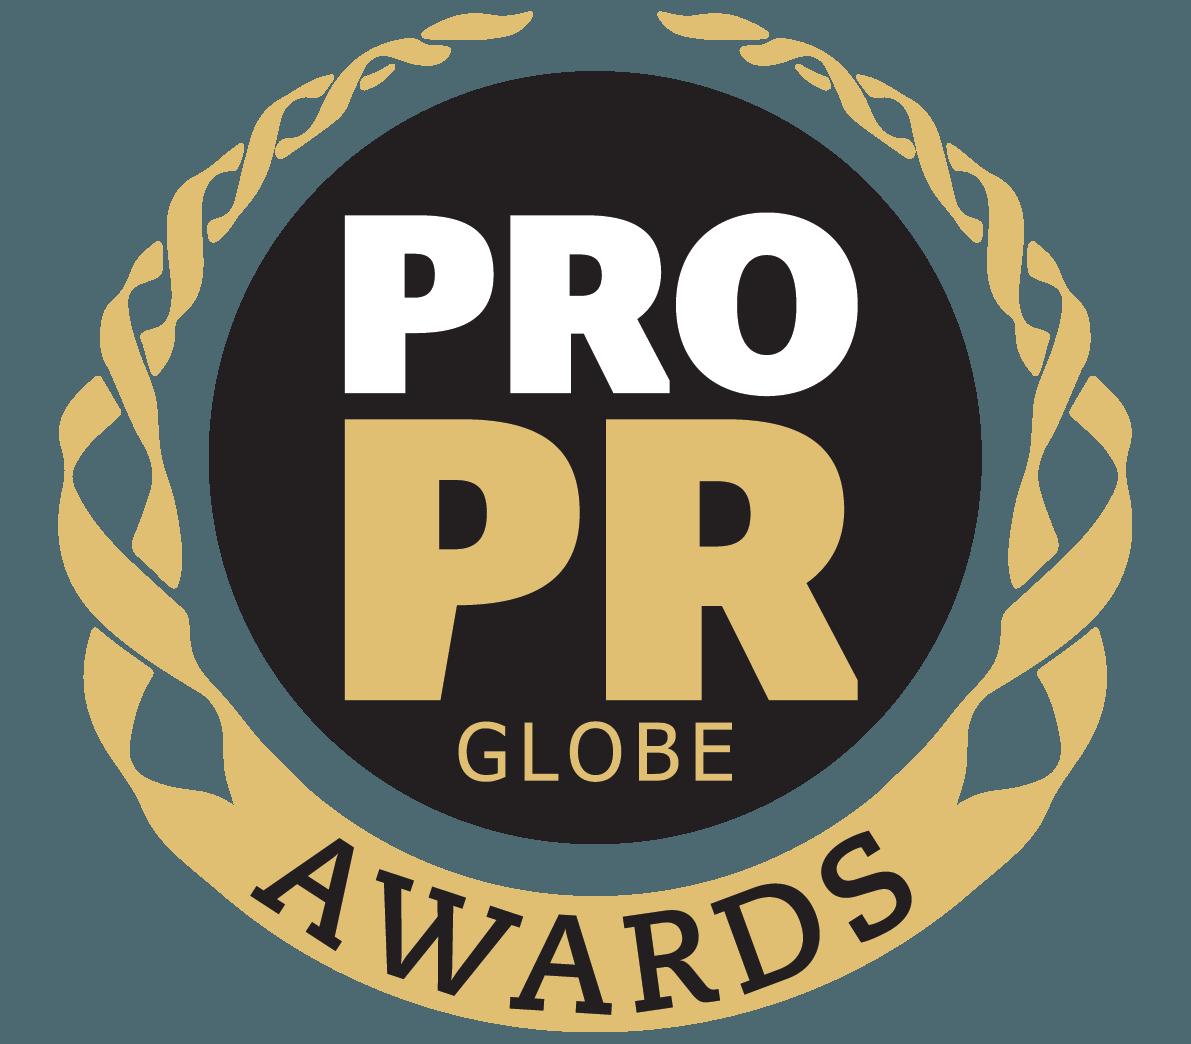 Objavljena imena dobitnika priznanja PRO PR Awards